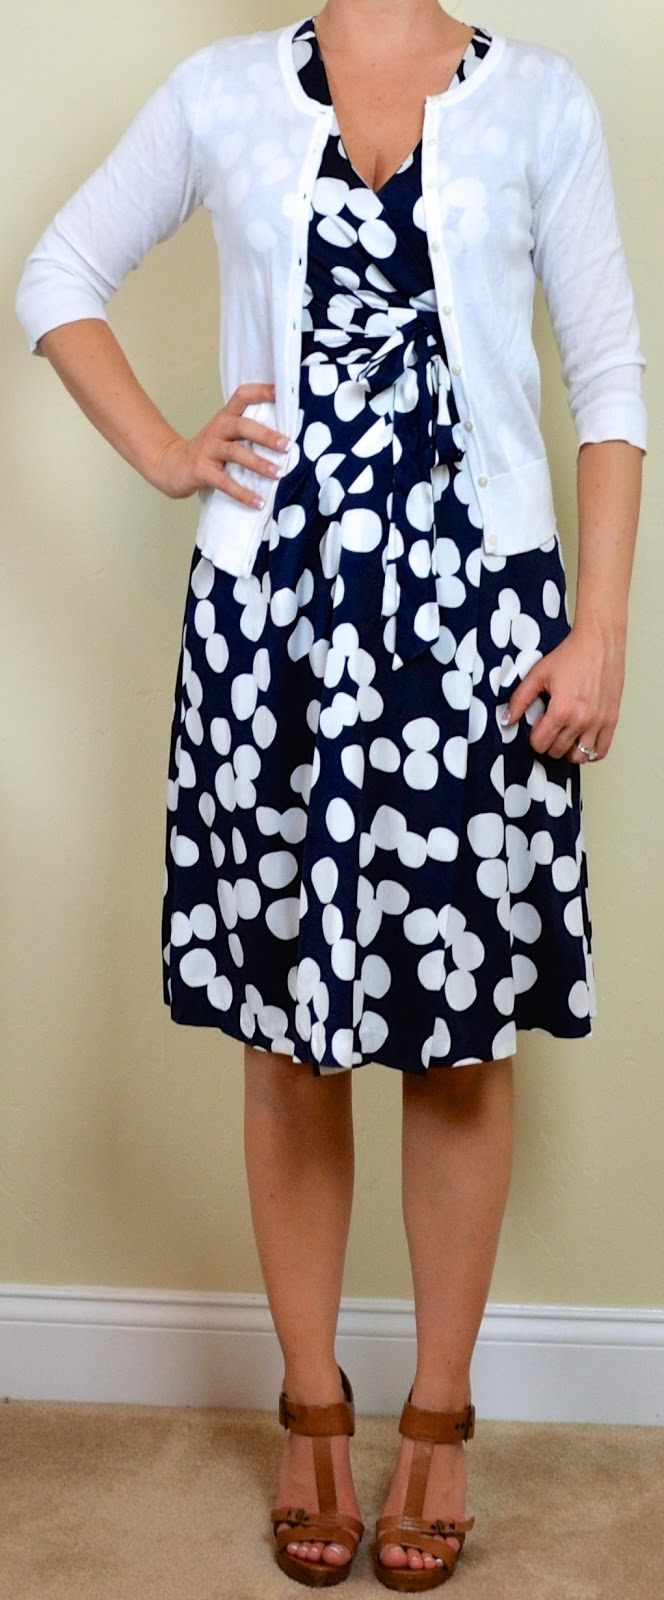 Outfit Post Navy U0026 White Polka Dot Dress White Cardigan ...